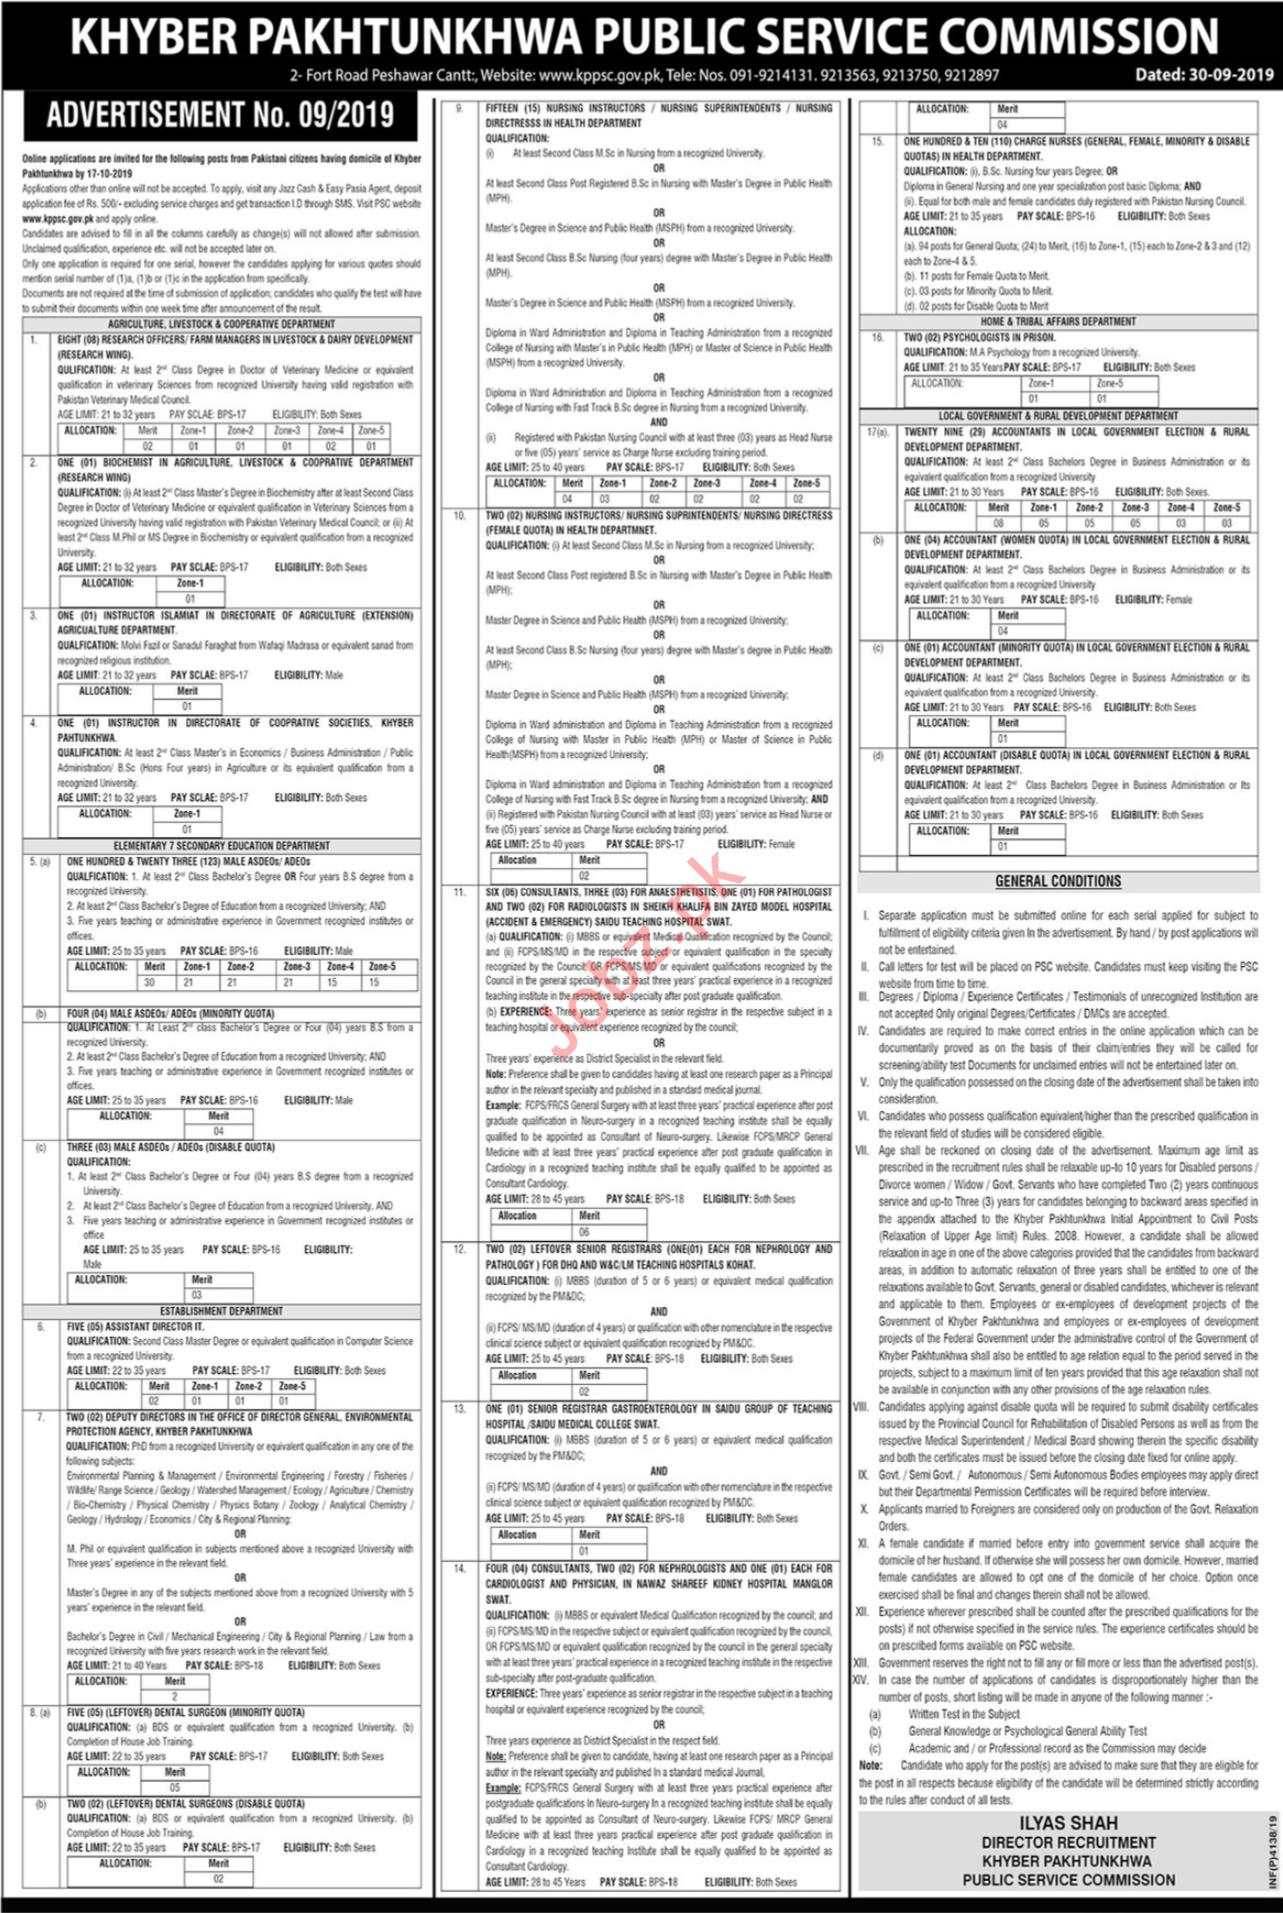 Khyber Pakhtunkhwa Public Service Commission Jobs 2019